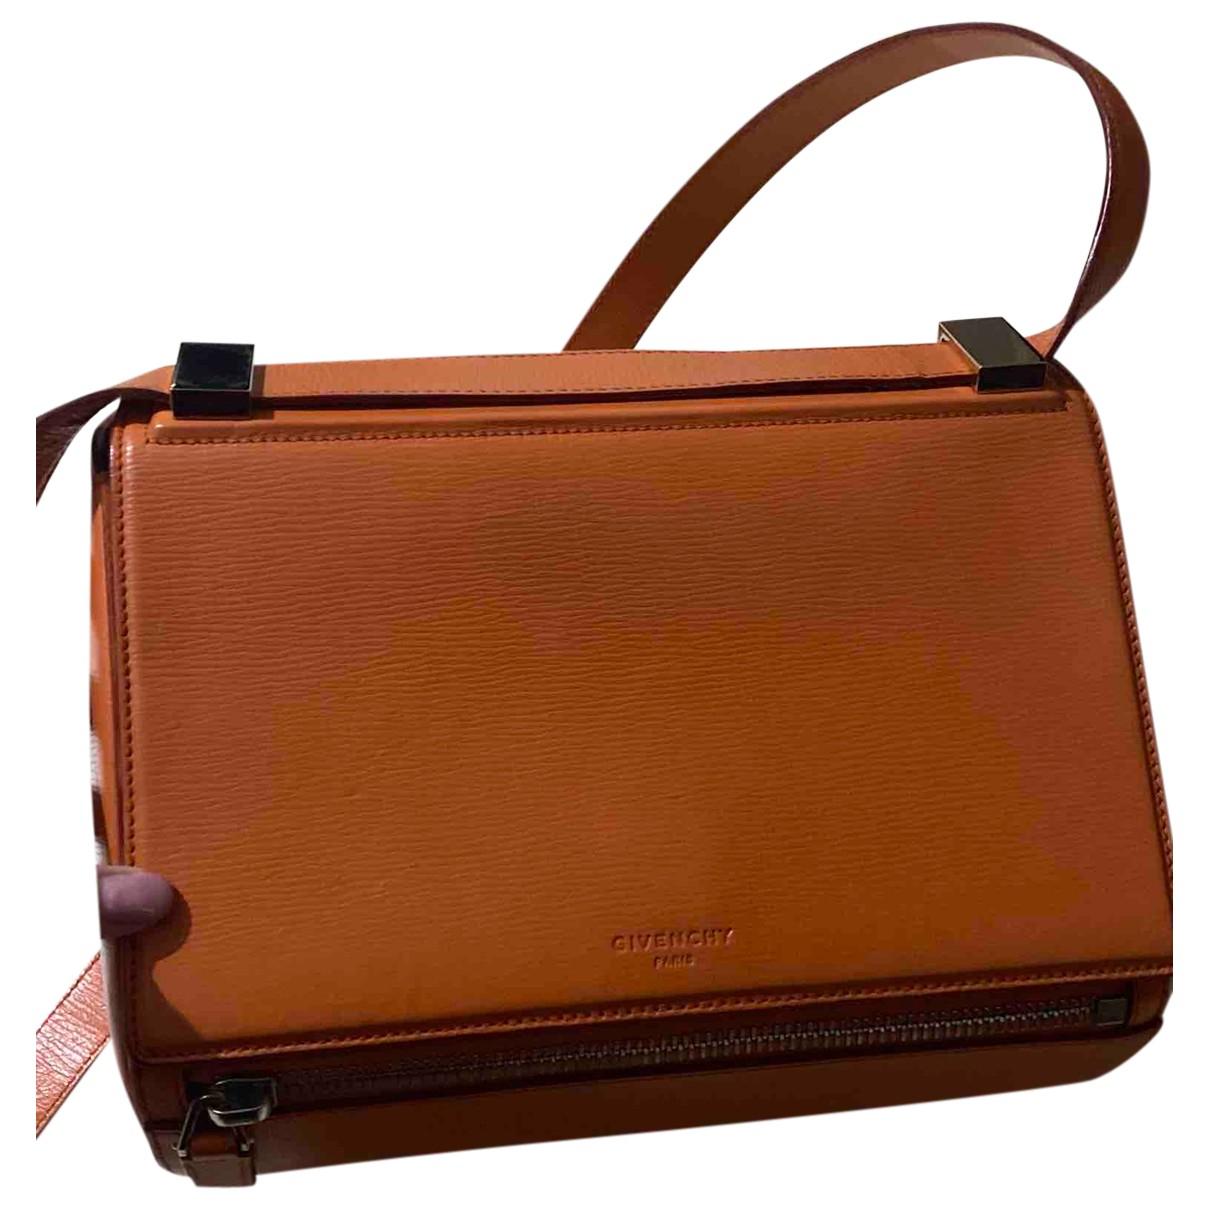 Givenchy Pandora Box Handtasche in  Orange Leder